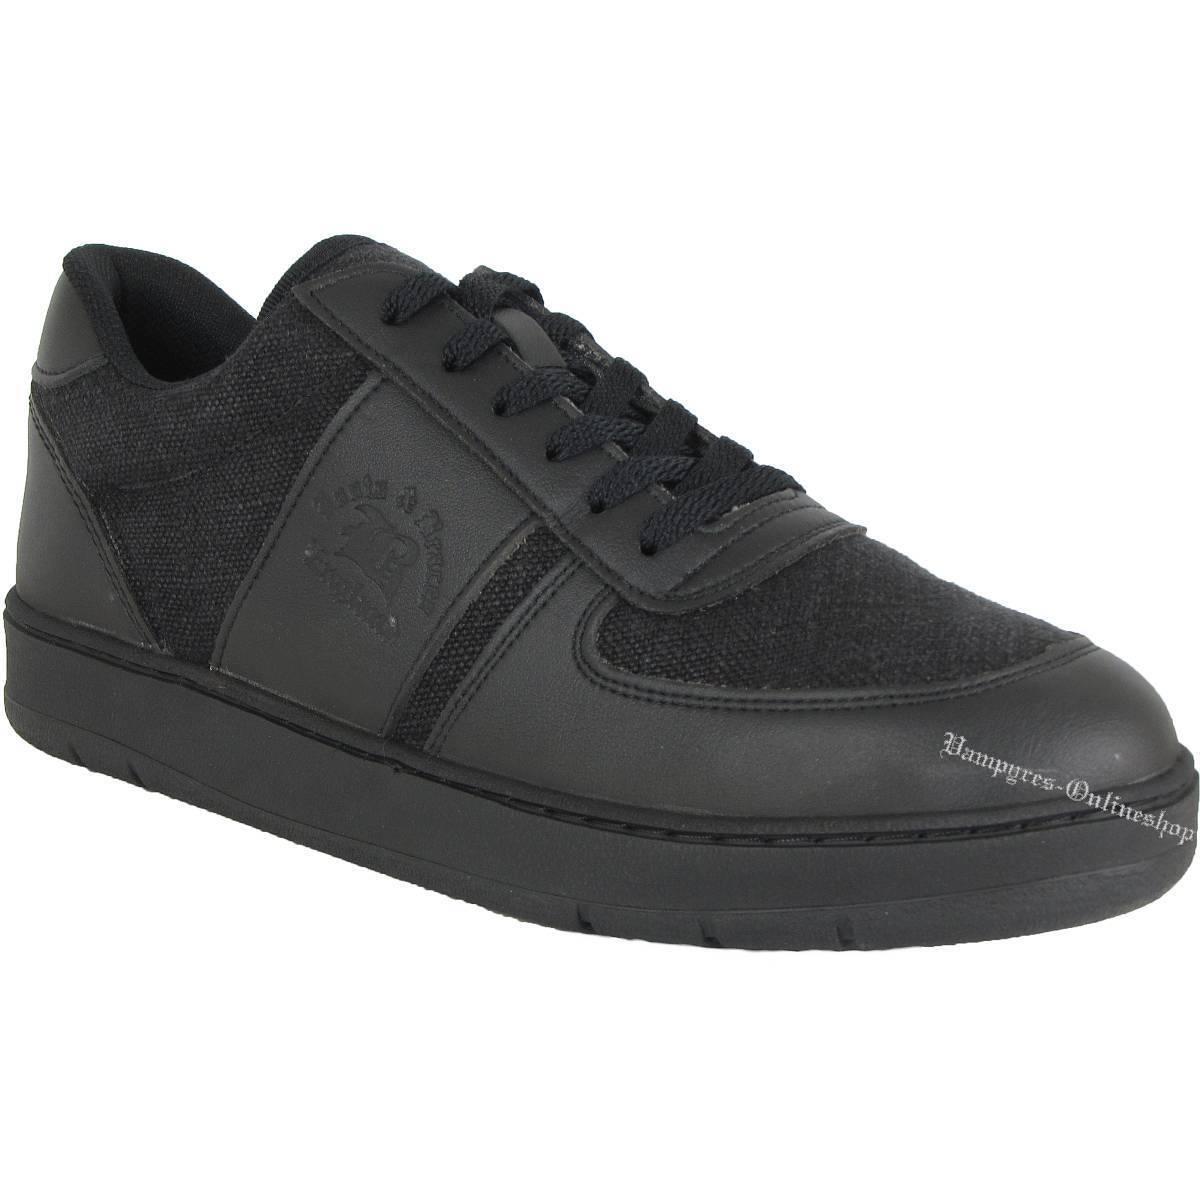 Boots & Vegane Braces Sneaker Vegetarian And Vegane & Zapatos Turnschuh Vegi Negro Noir ea3ca2